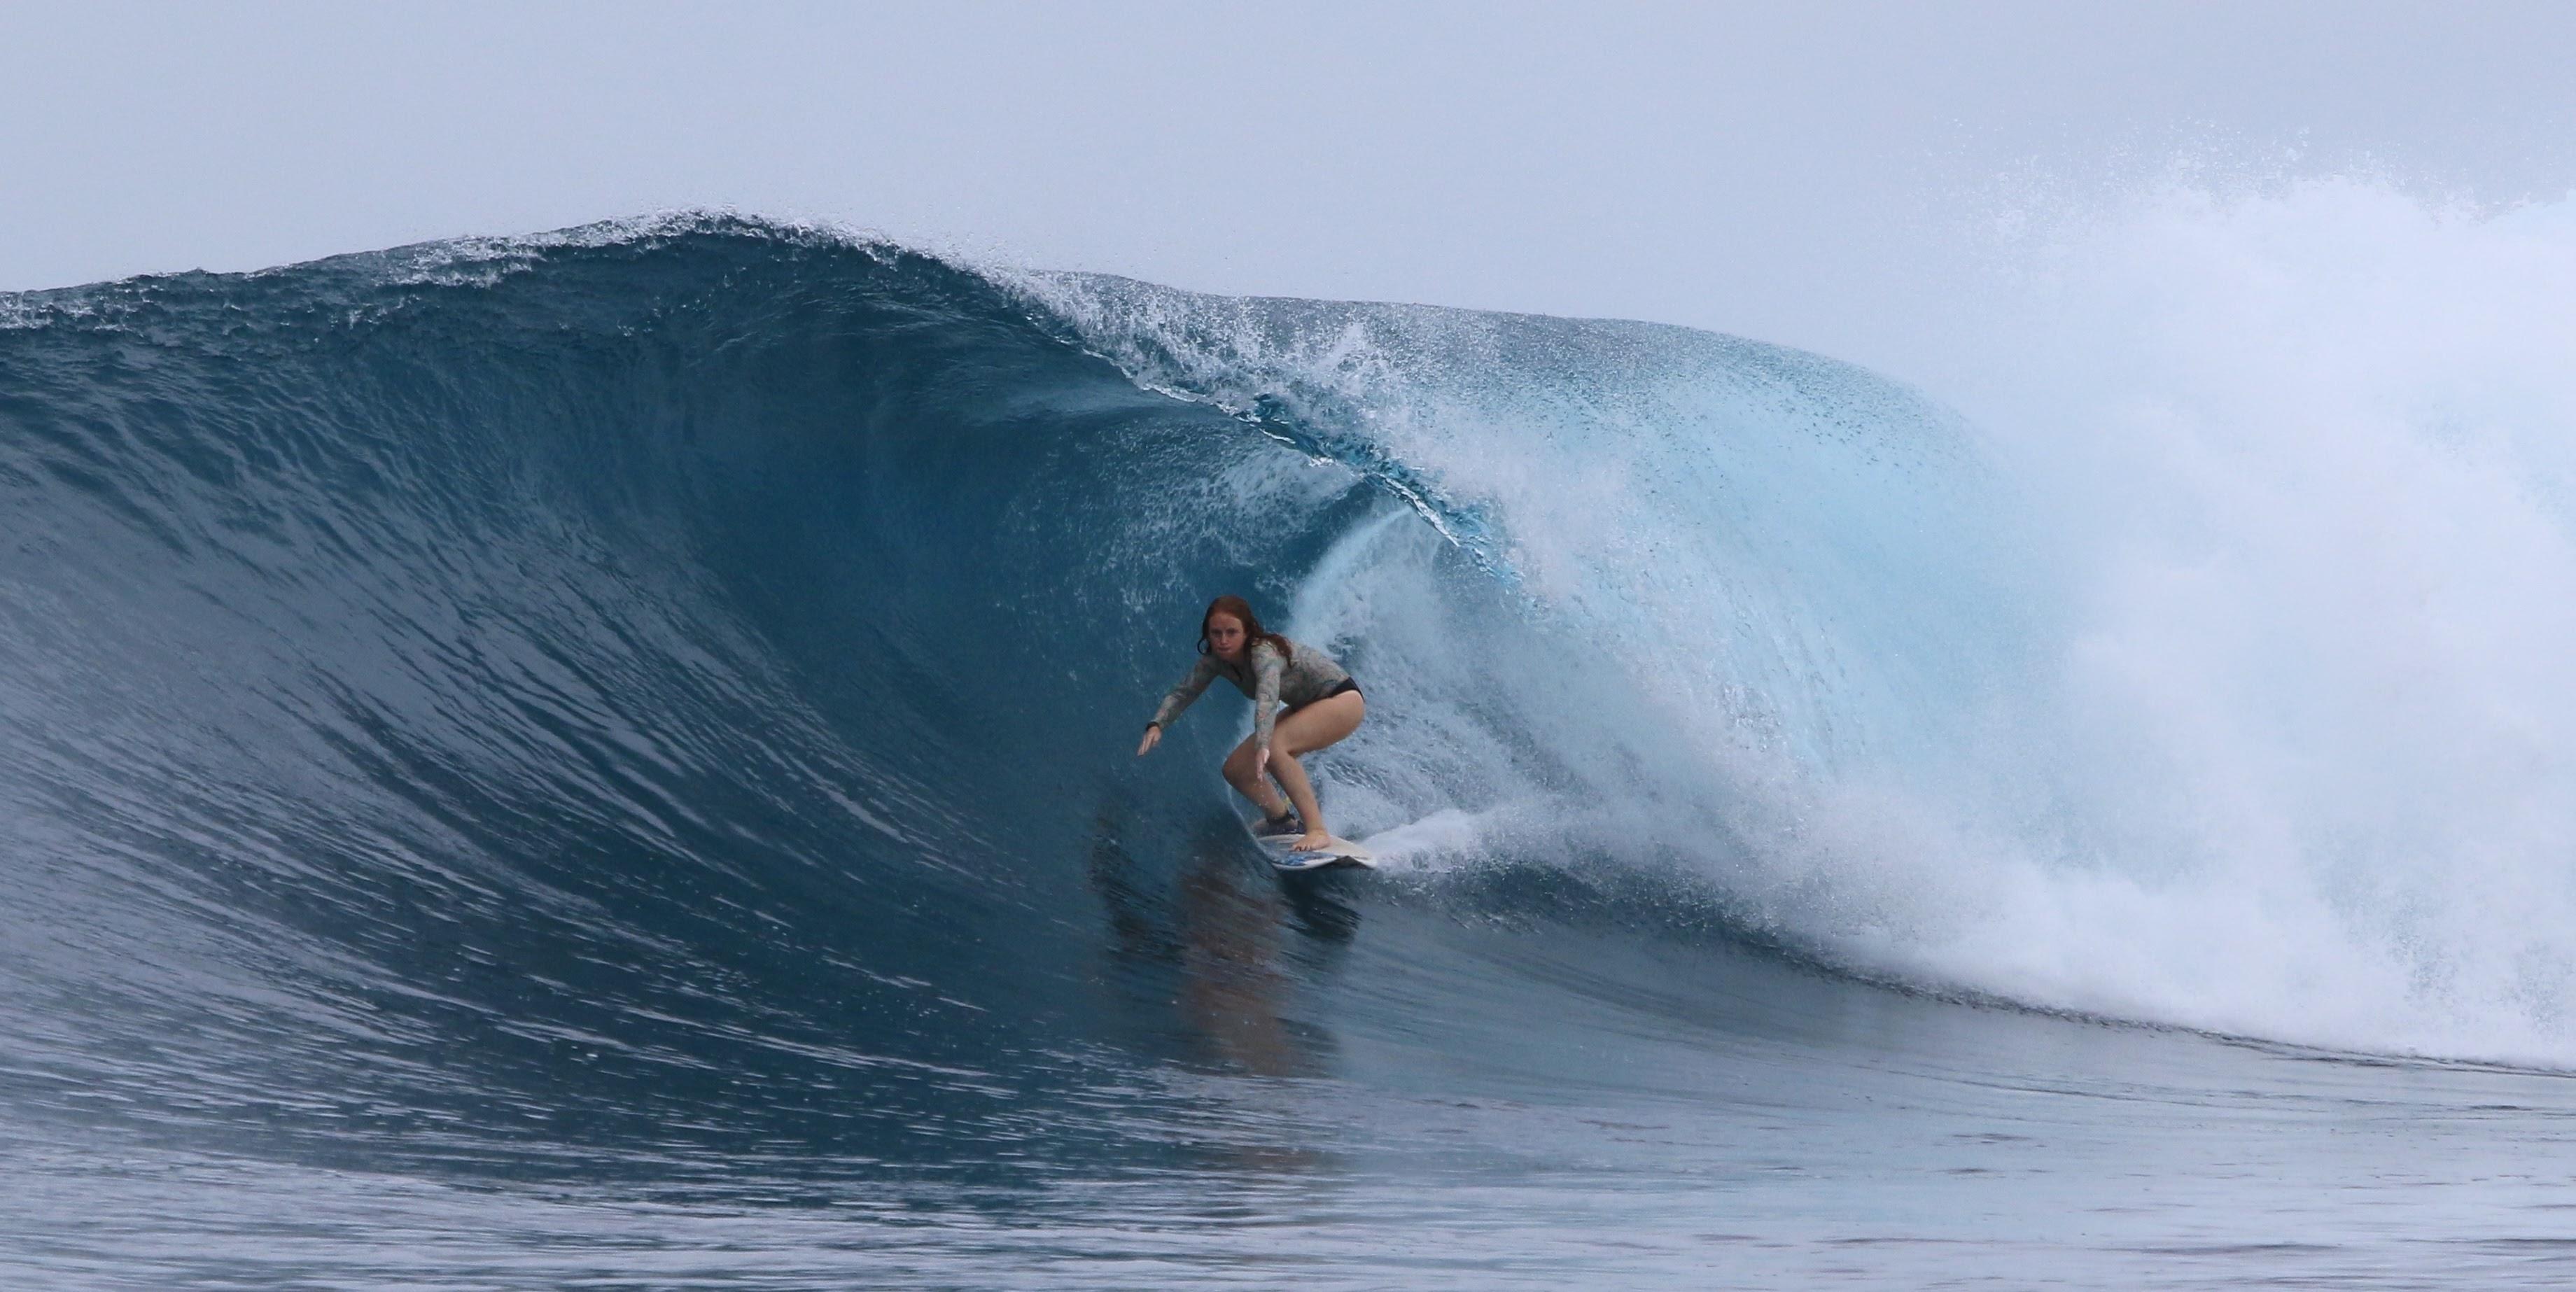 Grace Doyle Barrel  Billabong Team Rider. Female Pro Surfer.